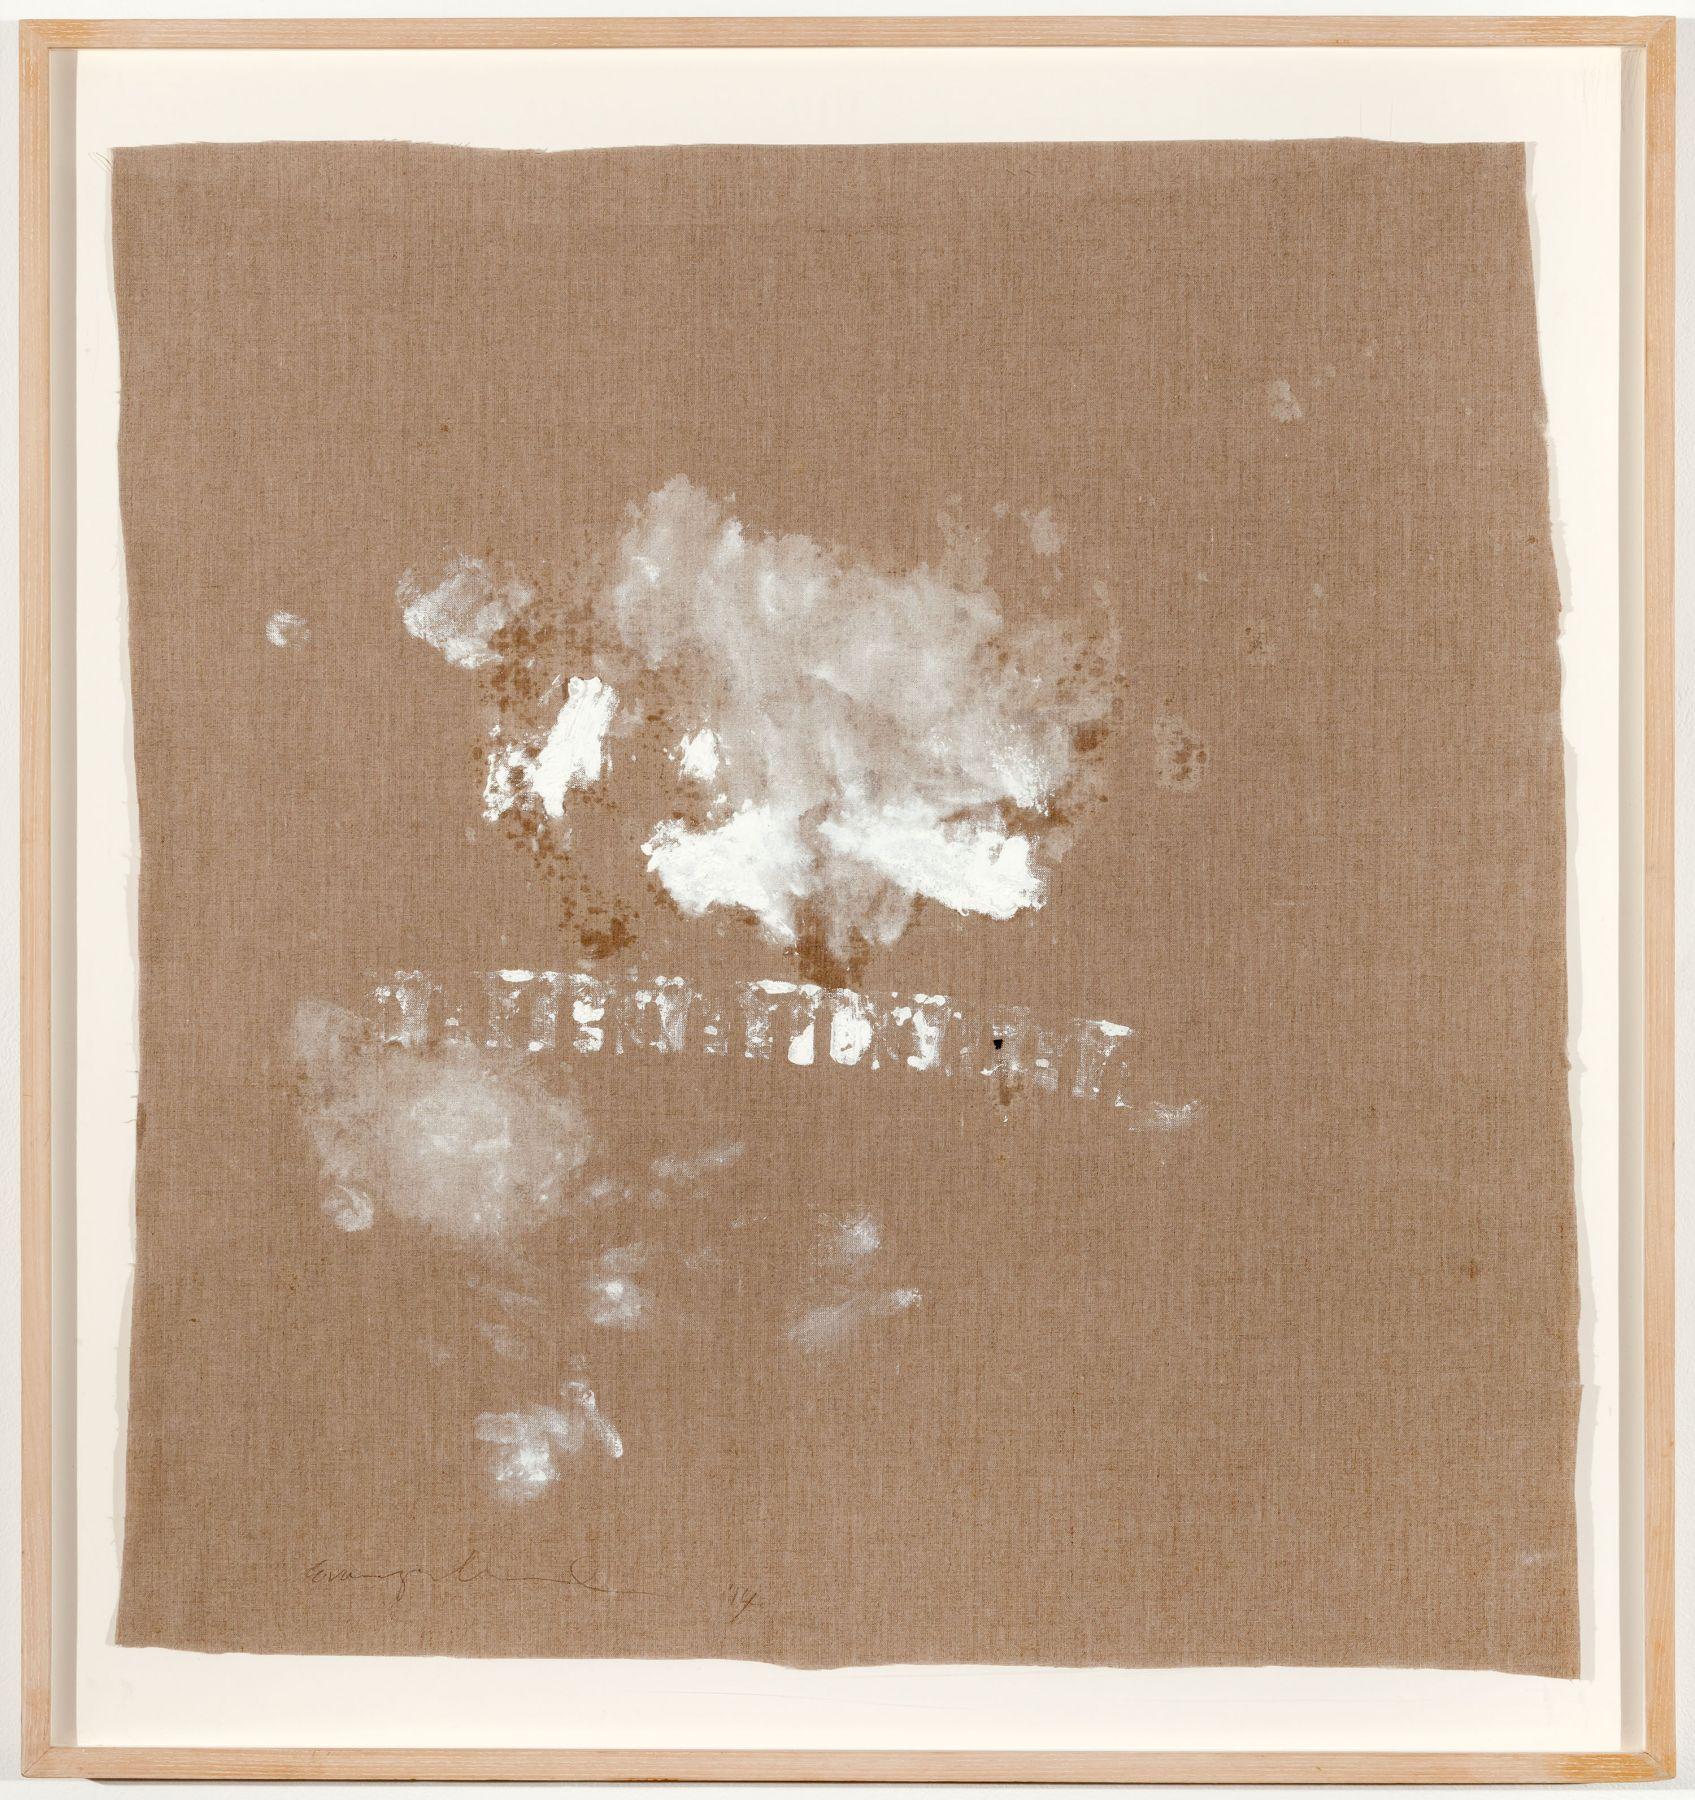 MARGARET EVANGELINE Disintegrating Relic, 2014